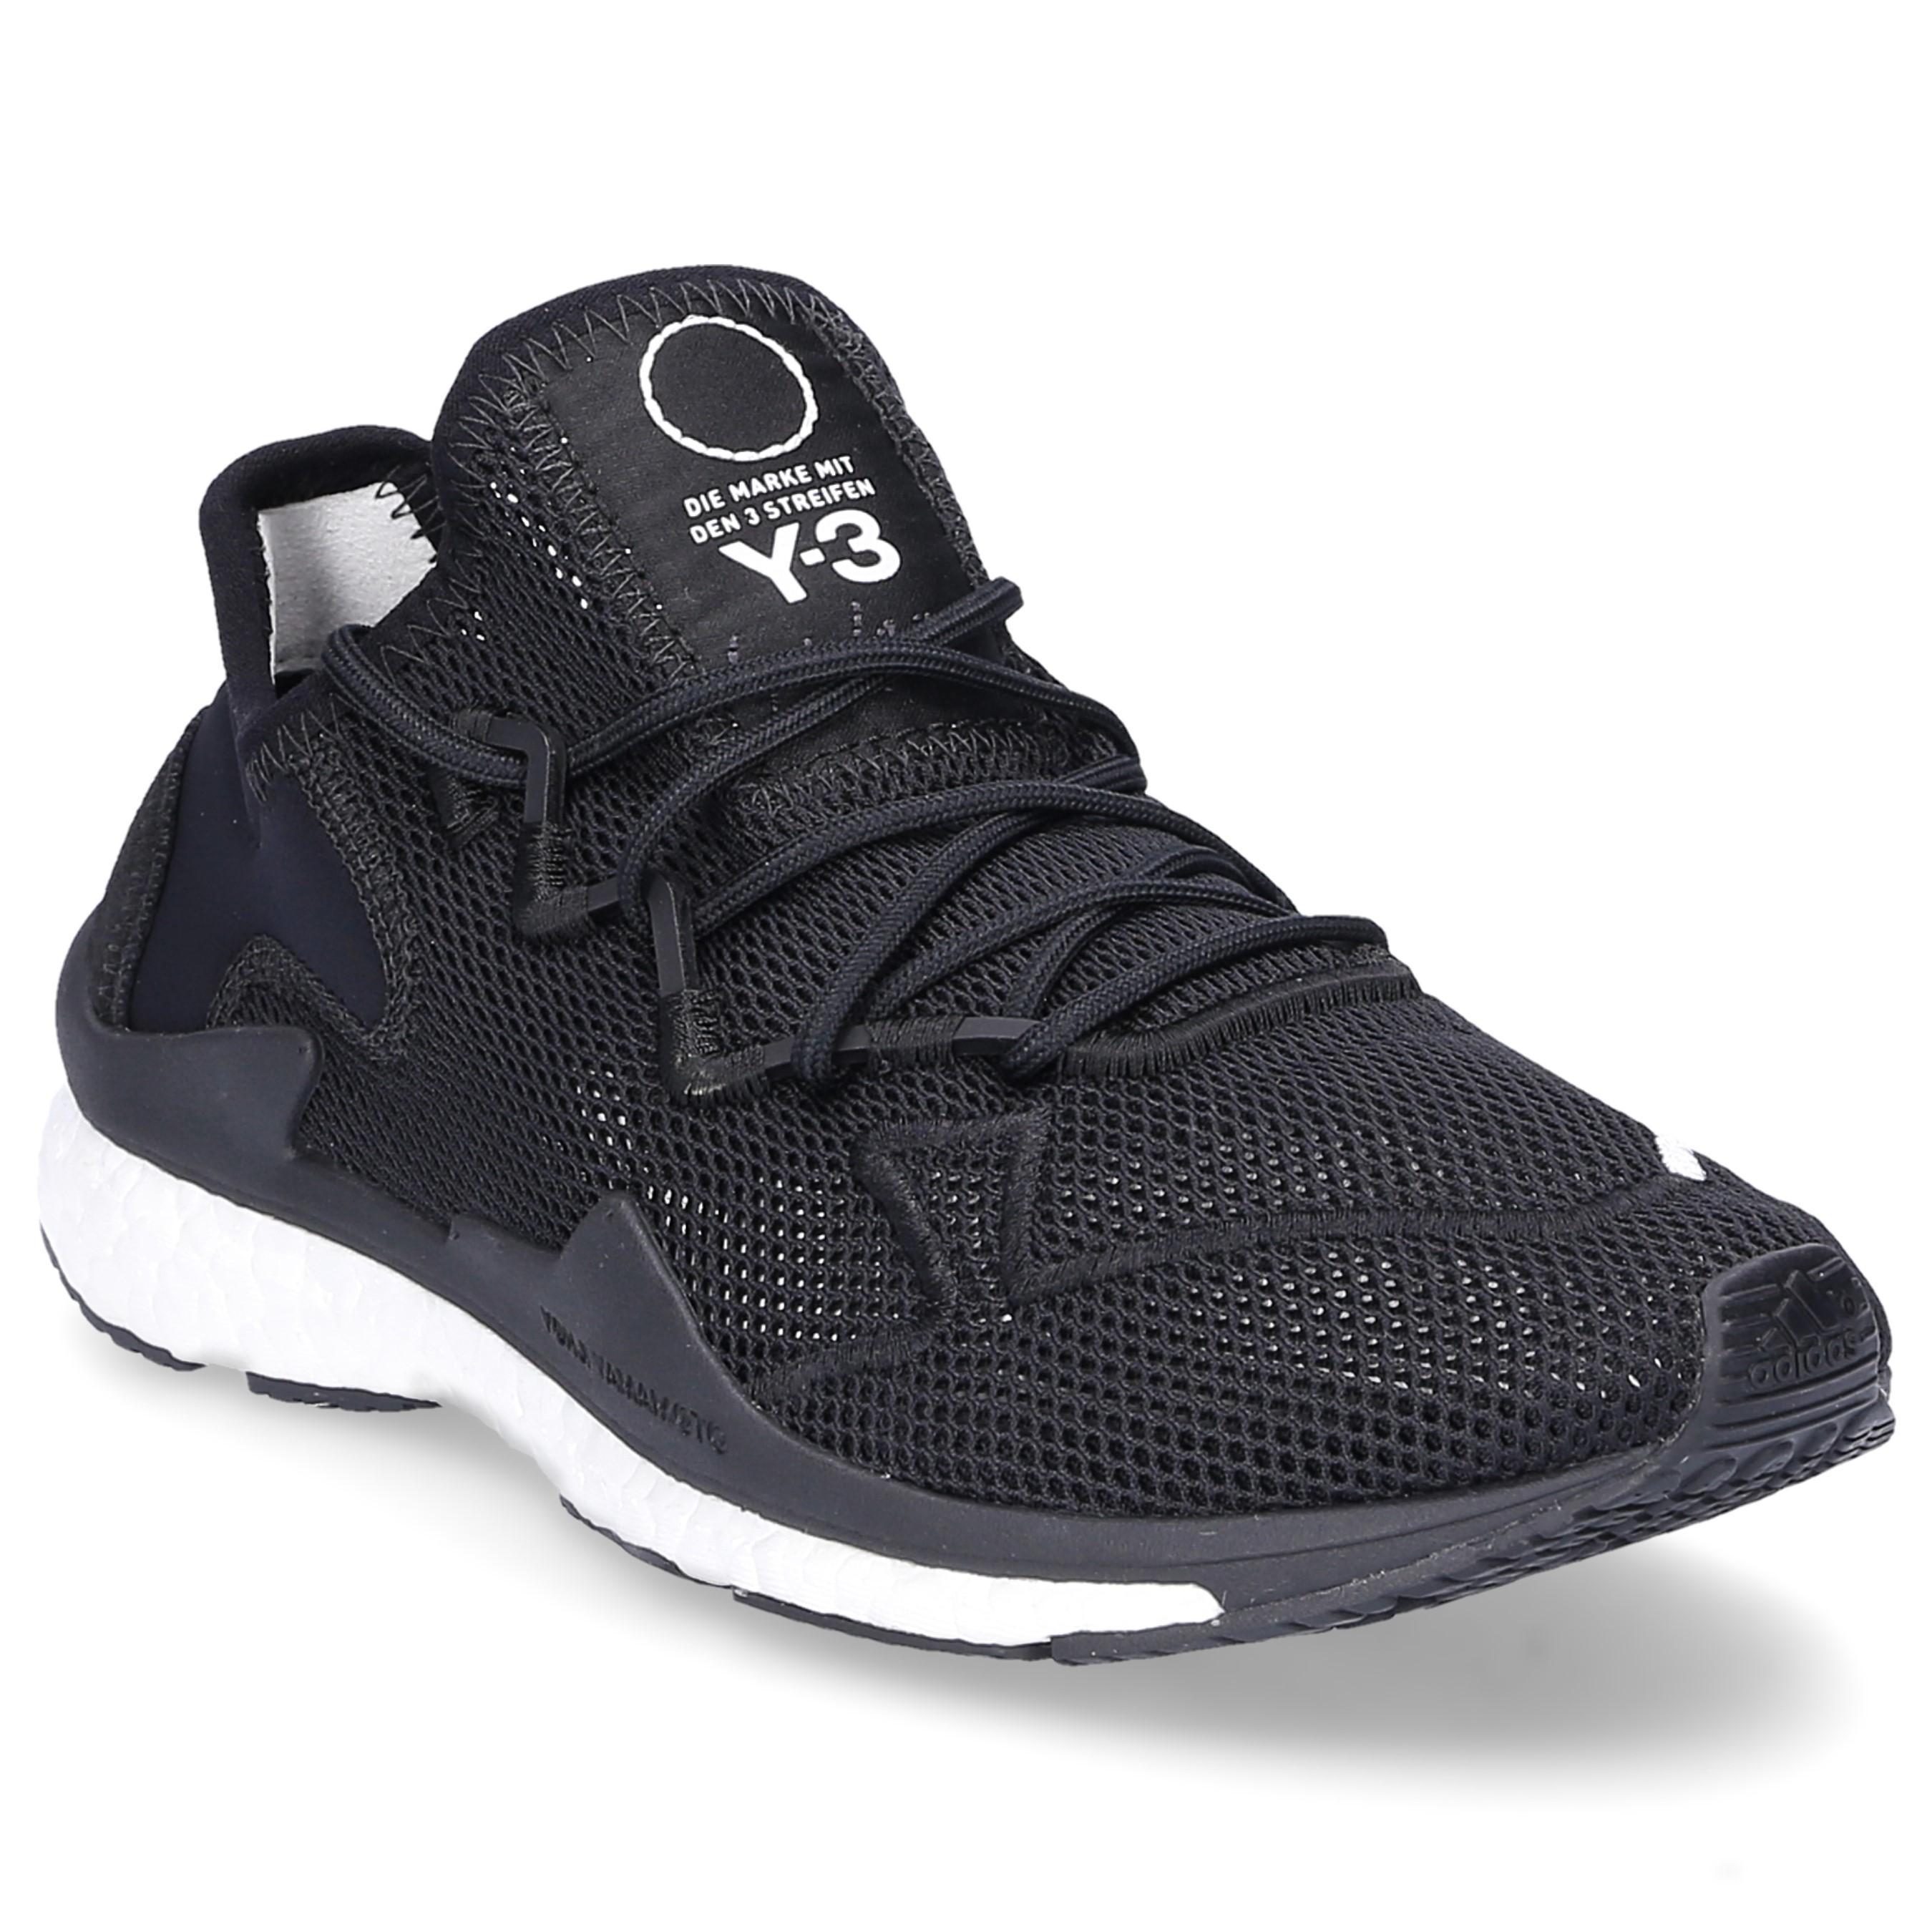 Y-3 Low-top Sneakers Adizero Runner Mesh Neoprene Logo Black